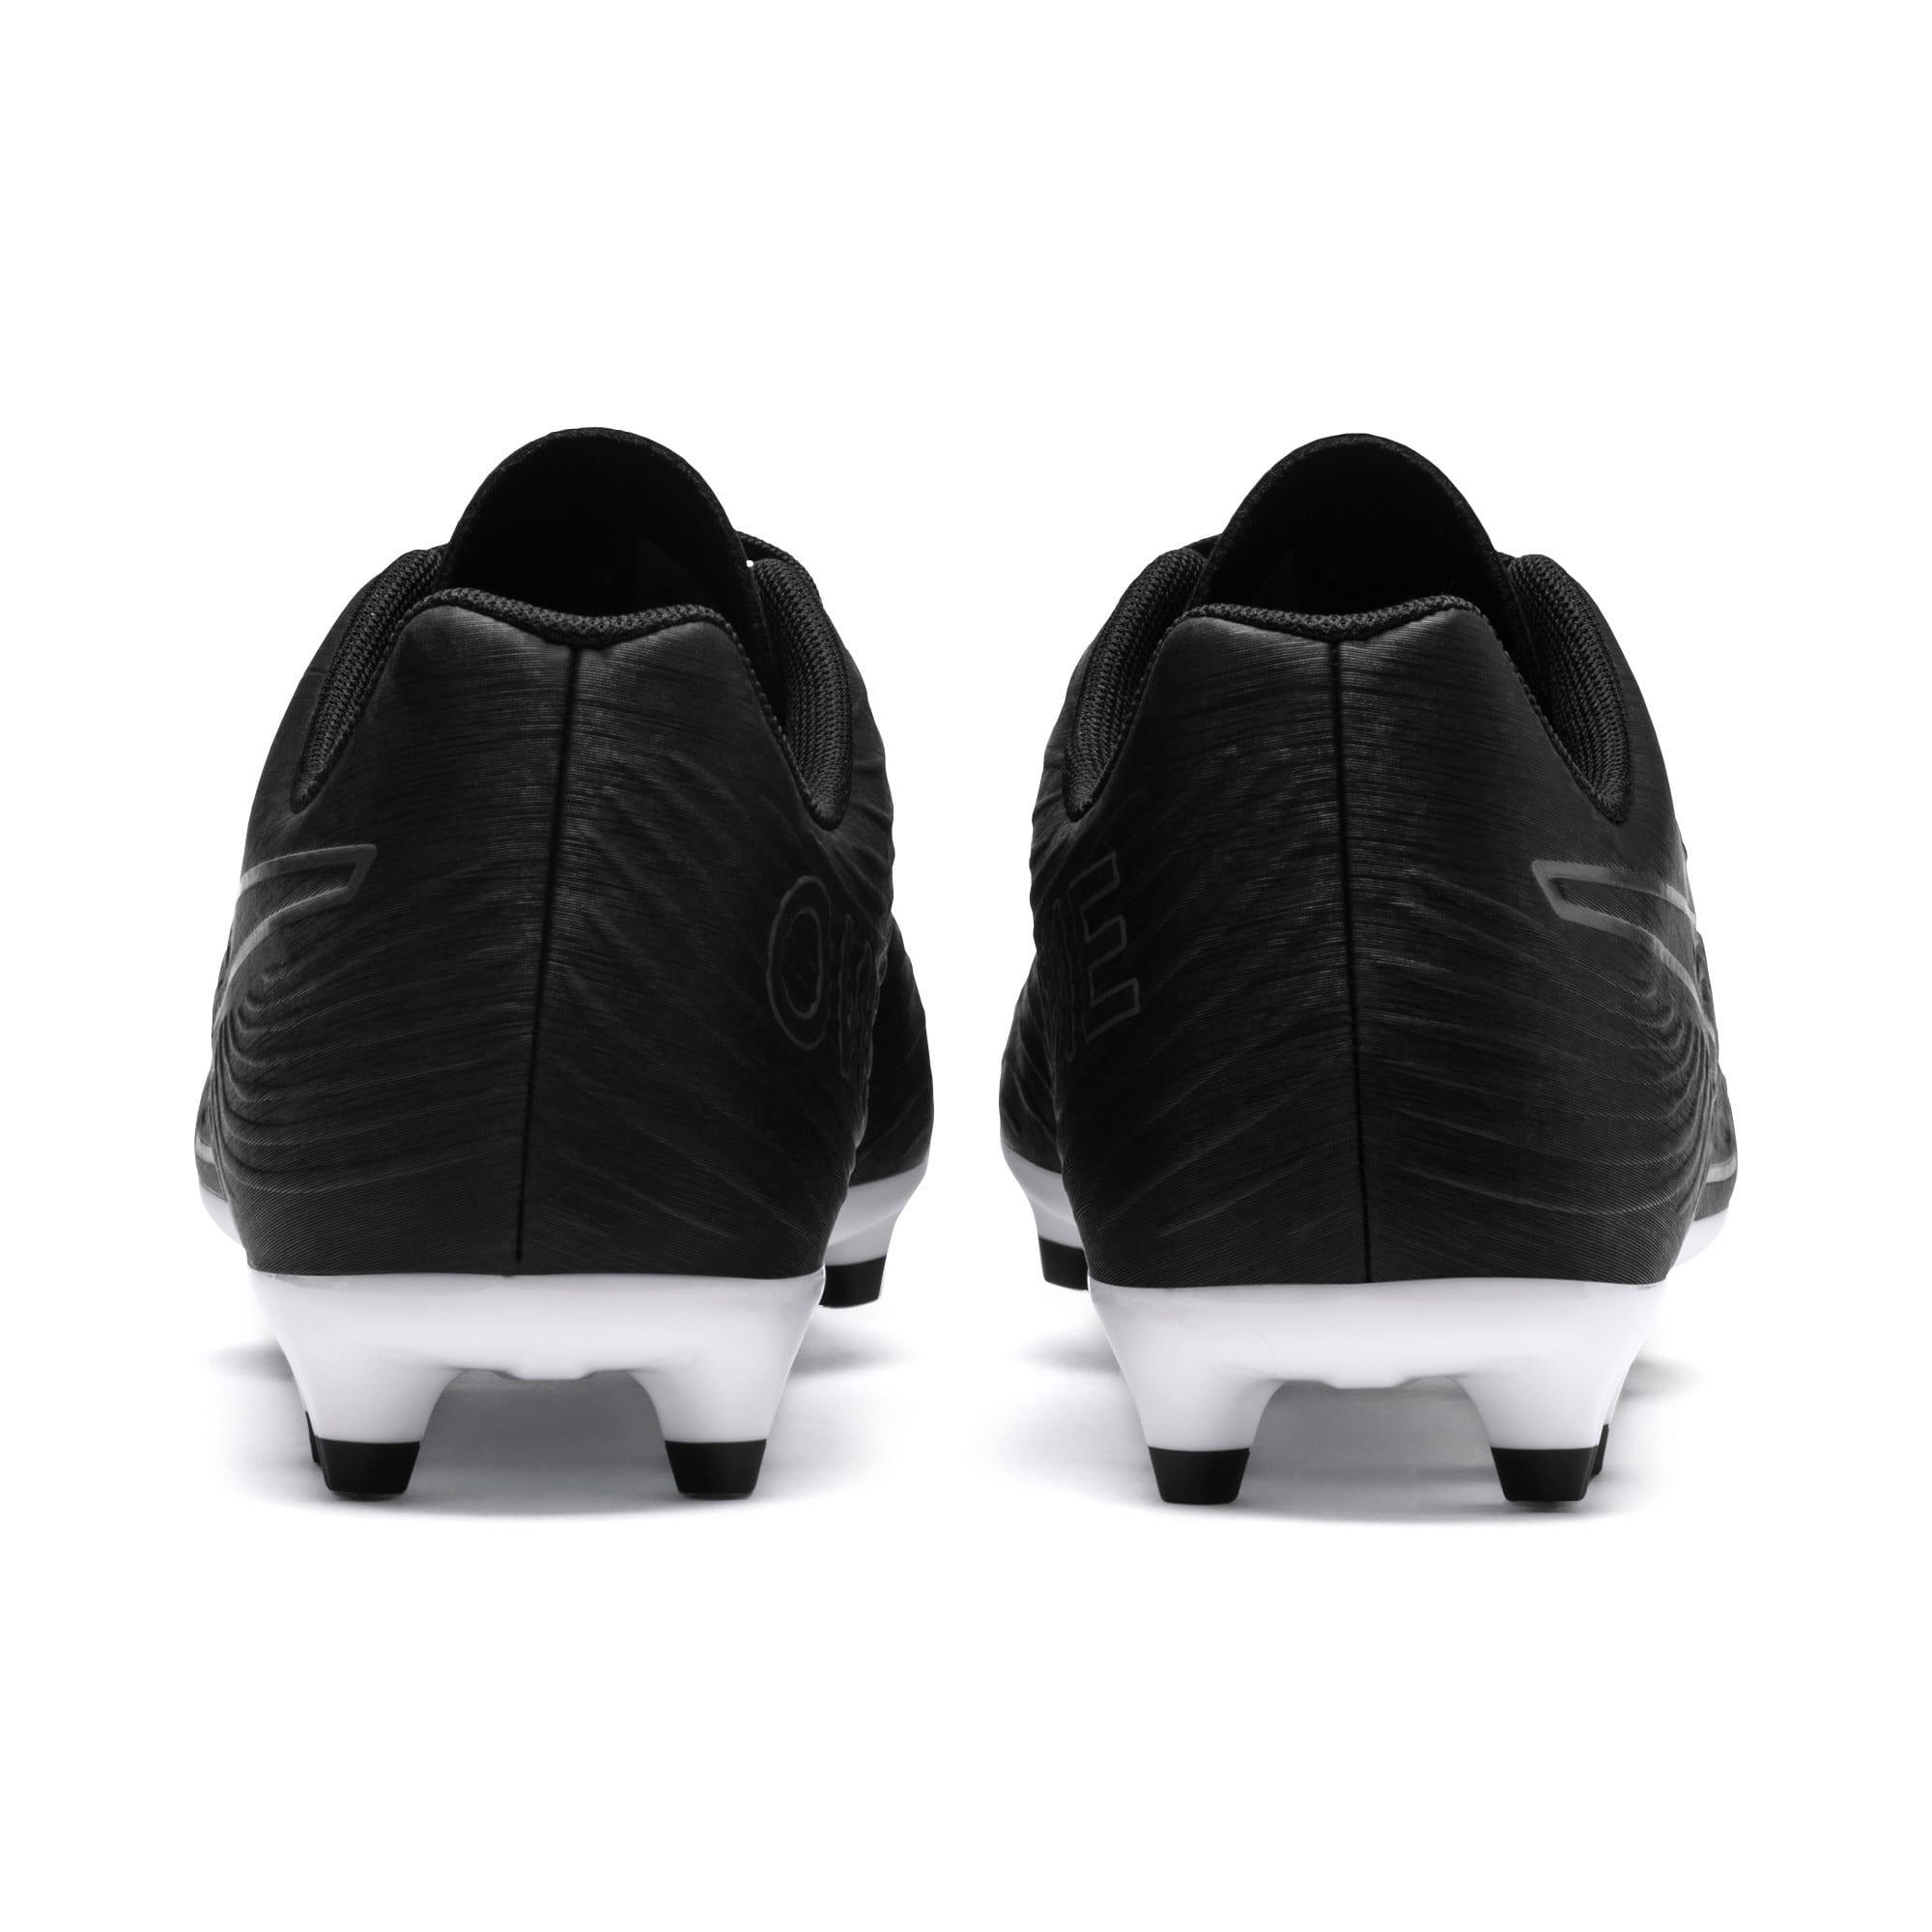 Thumbnail 3 of PUMA ONE 19.4 FG/AG Men's Soccer Cleats, Puma Black-Puma Black-White, medium